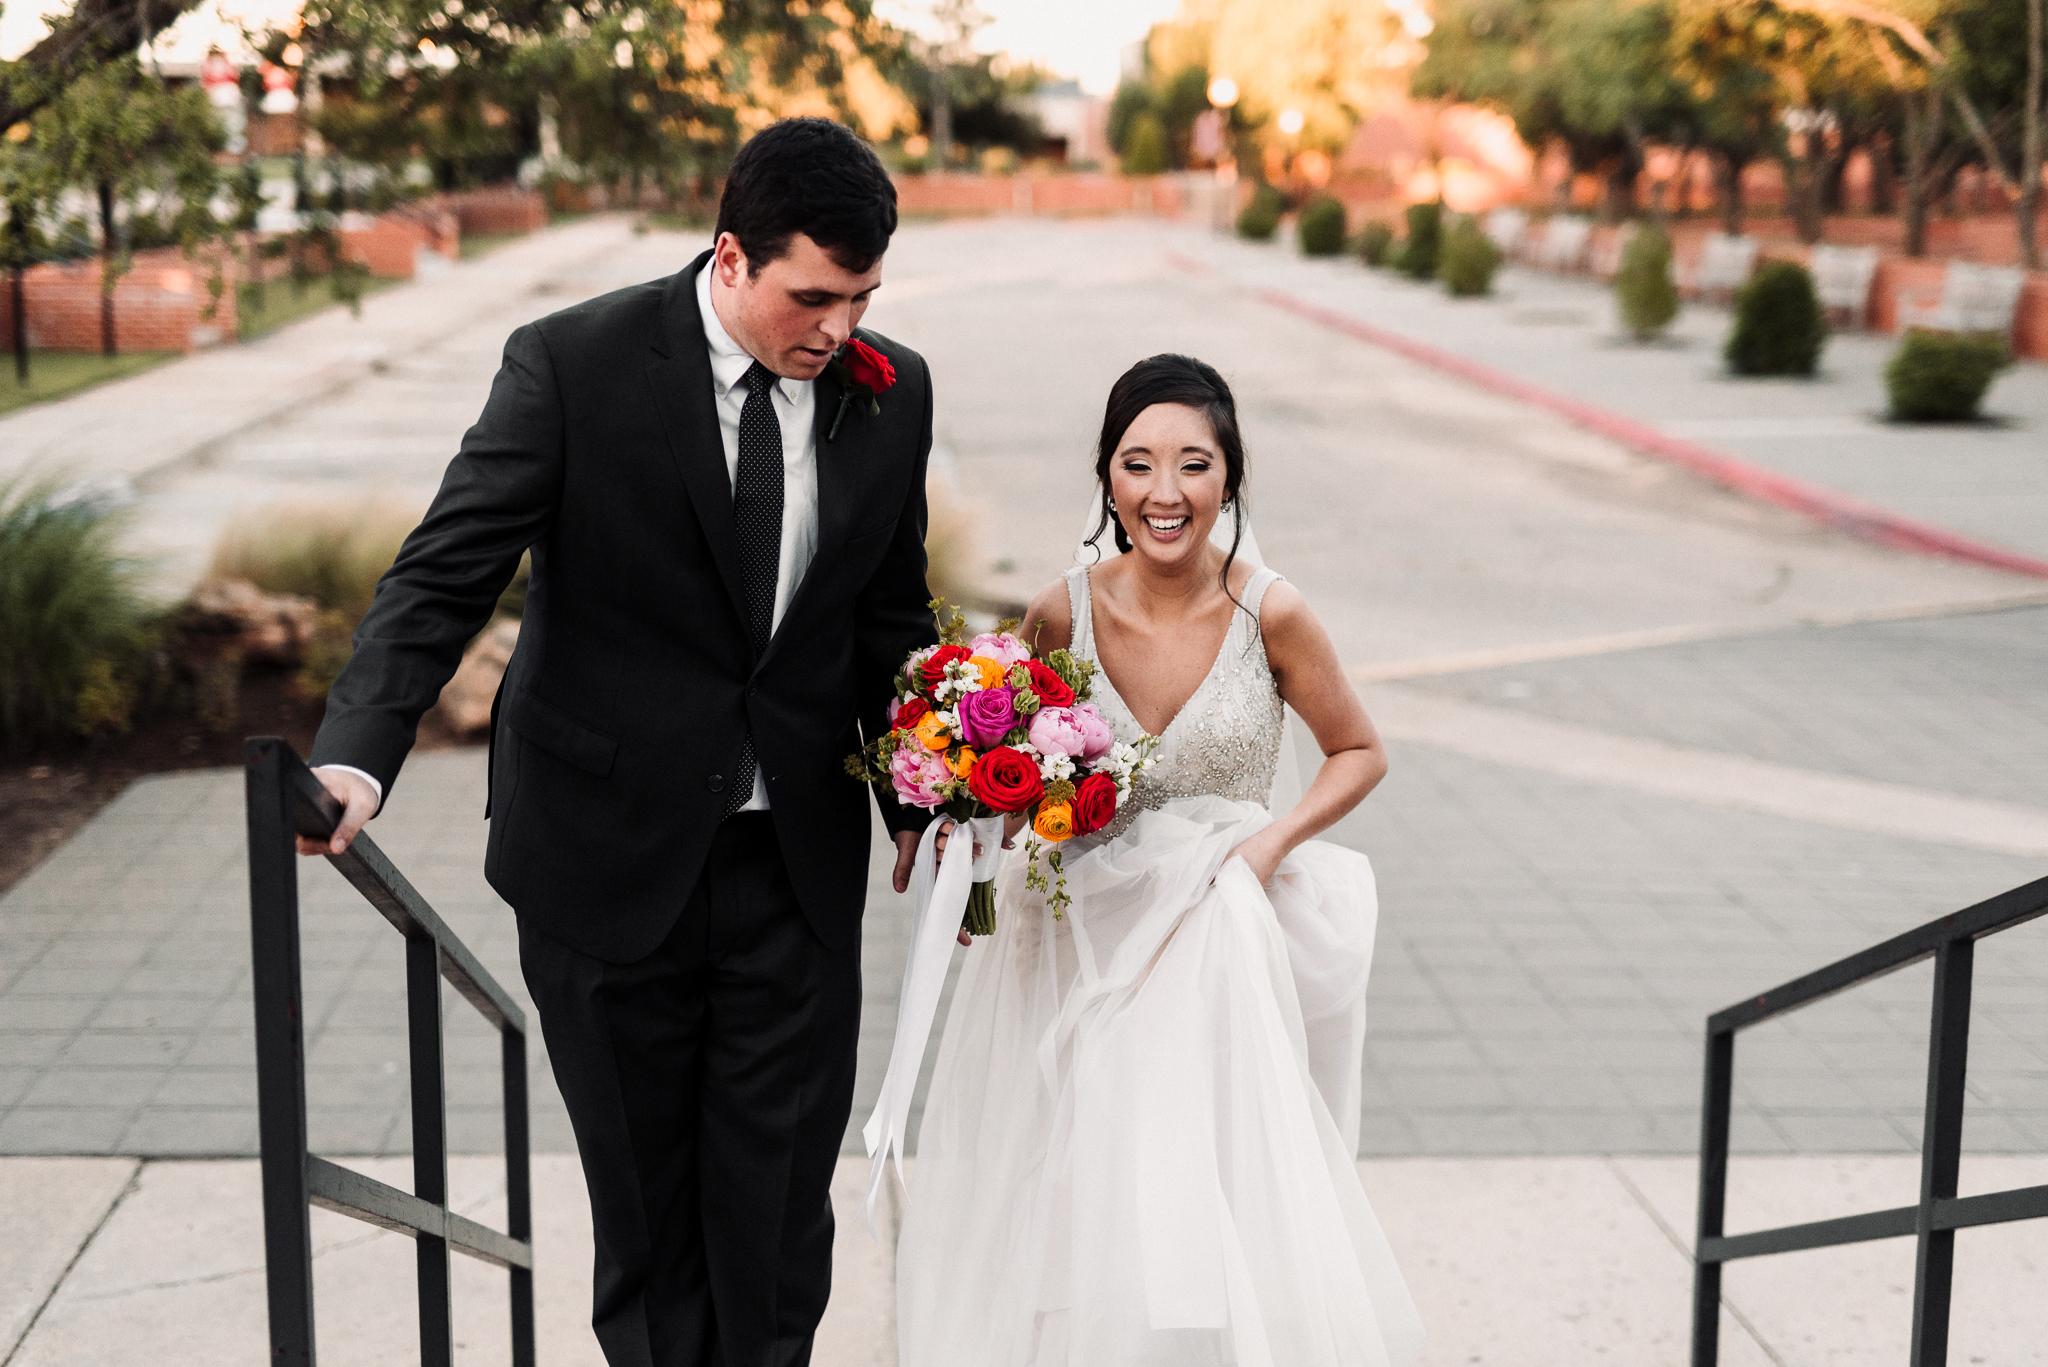 Oklahoma-Christian-University-Wedding-9085.jpg